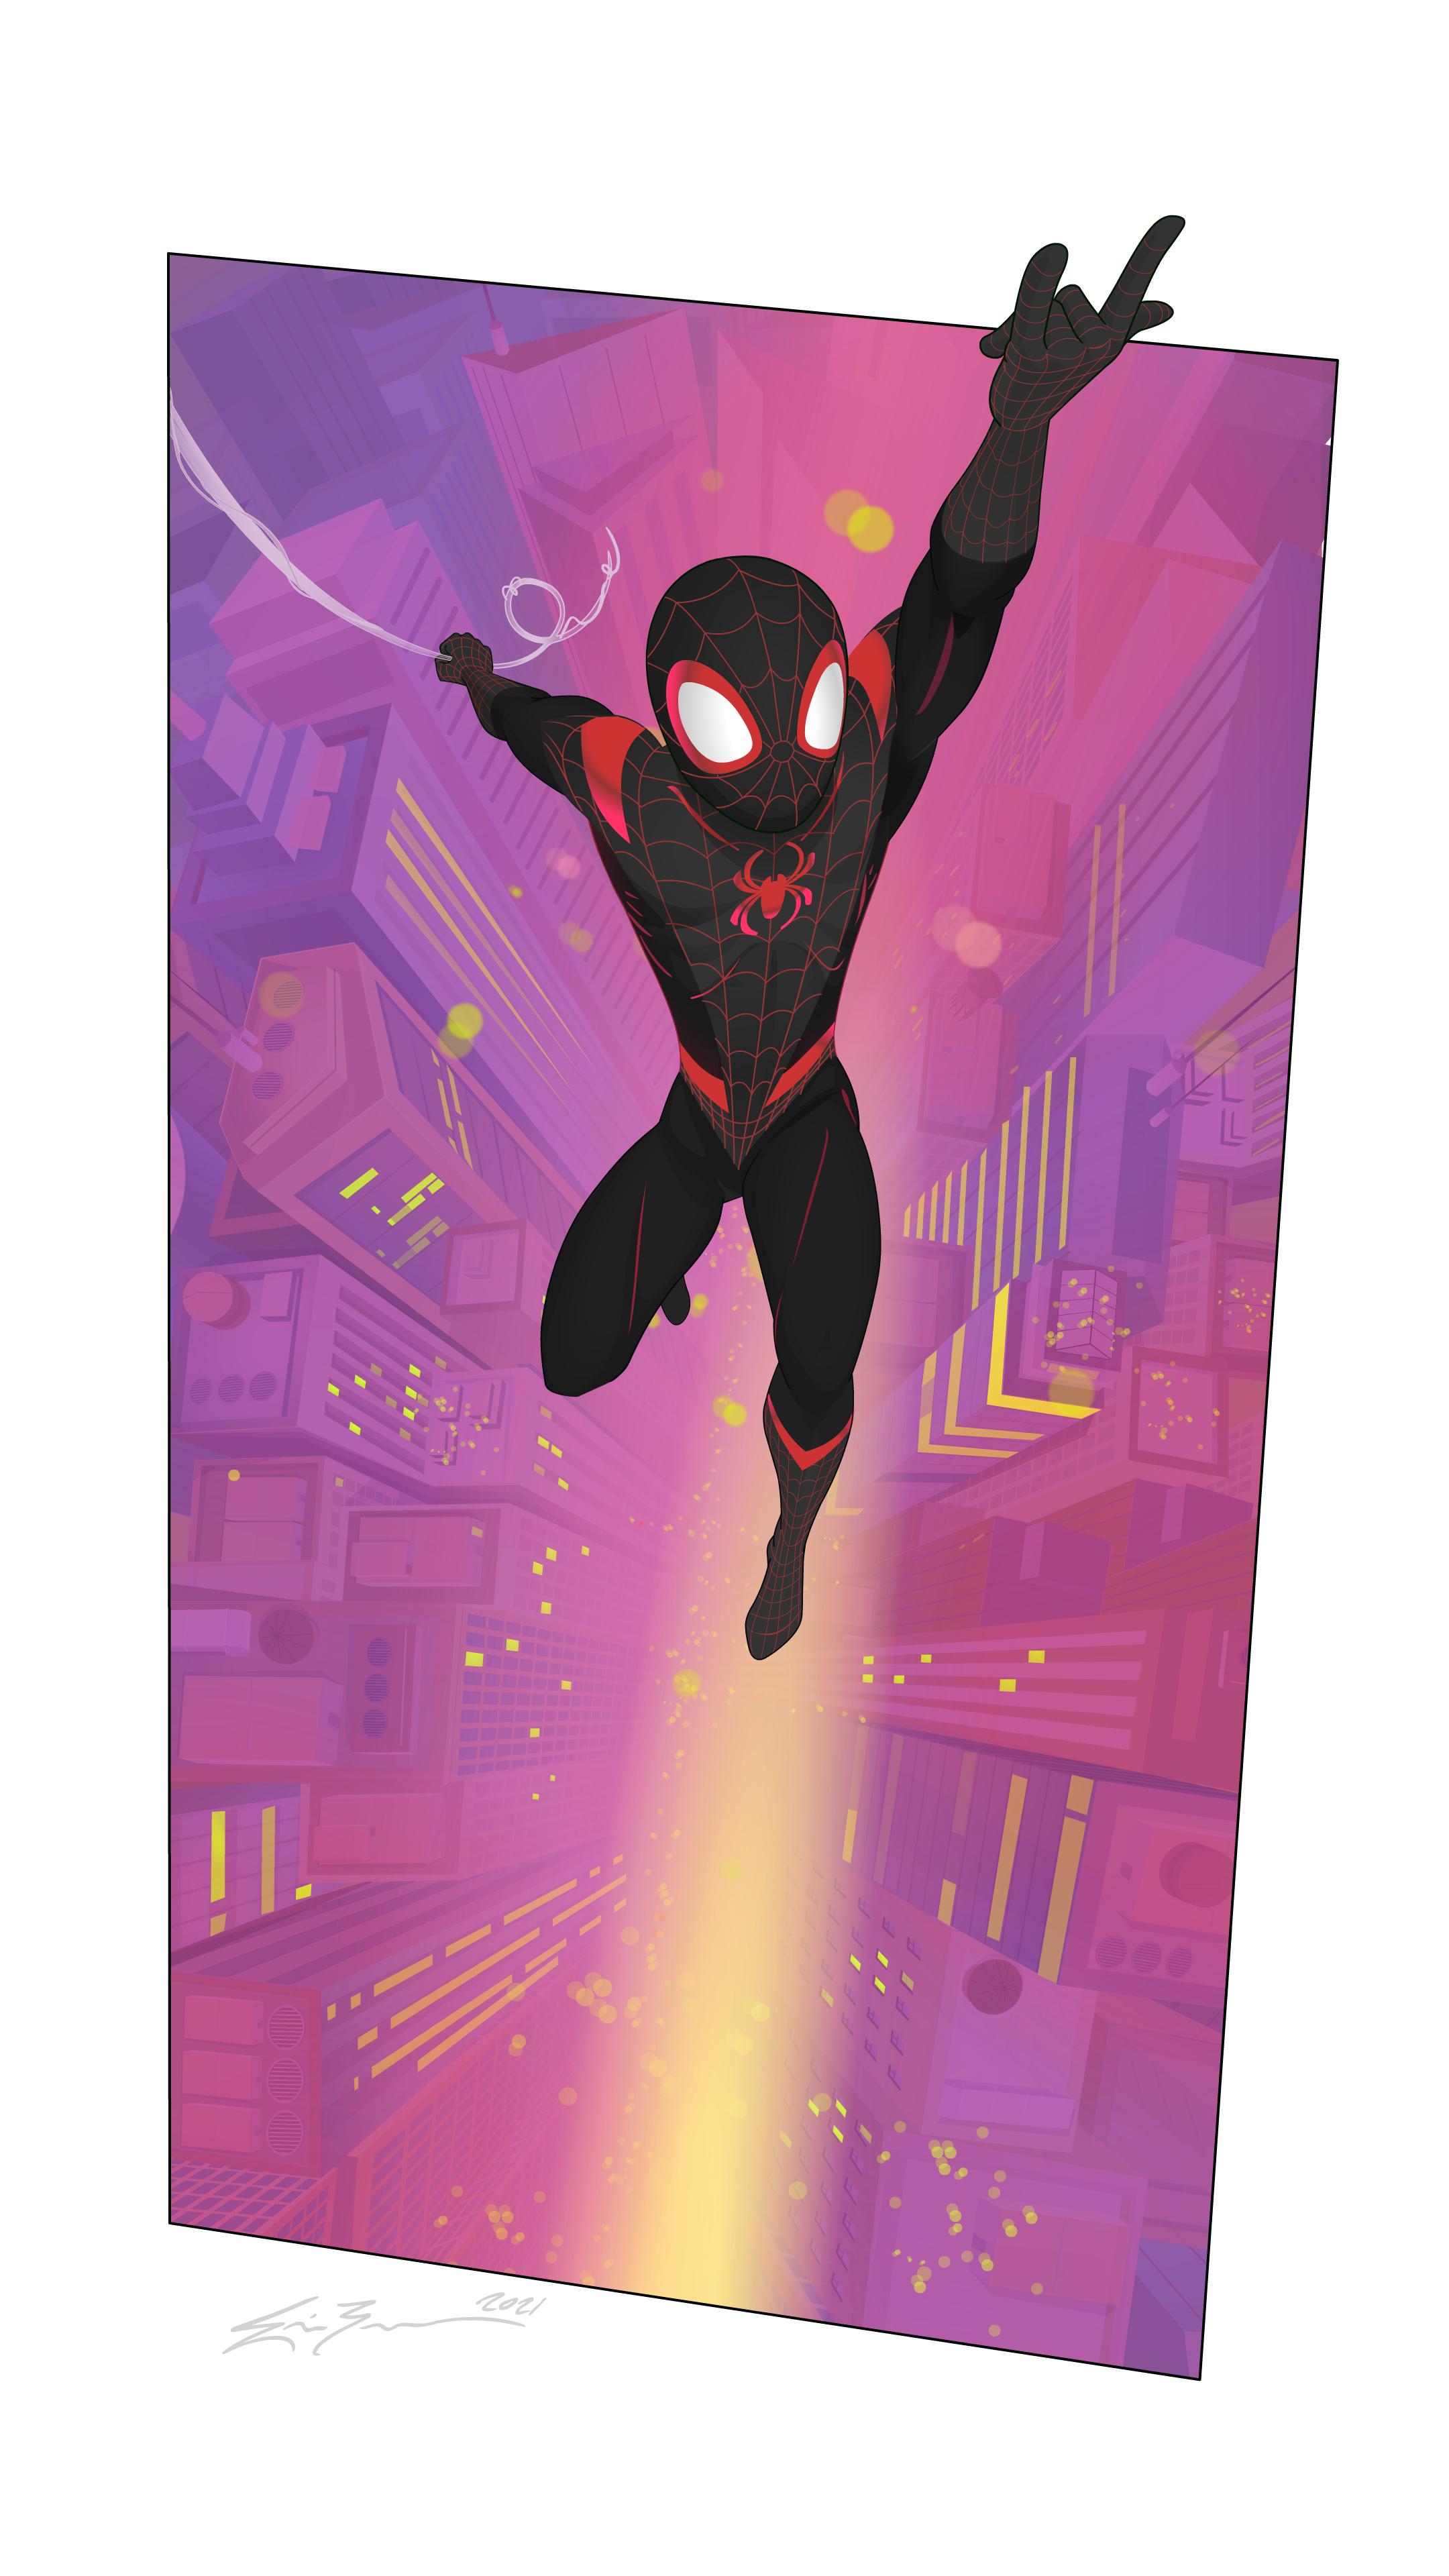 04_Spider-man_2021_Morales